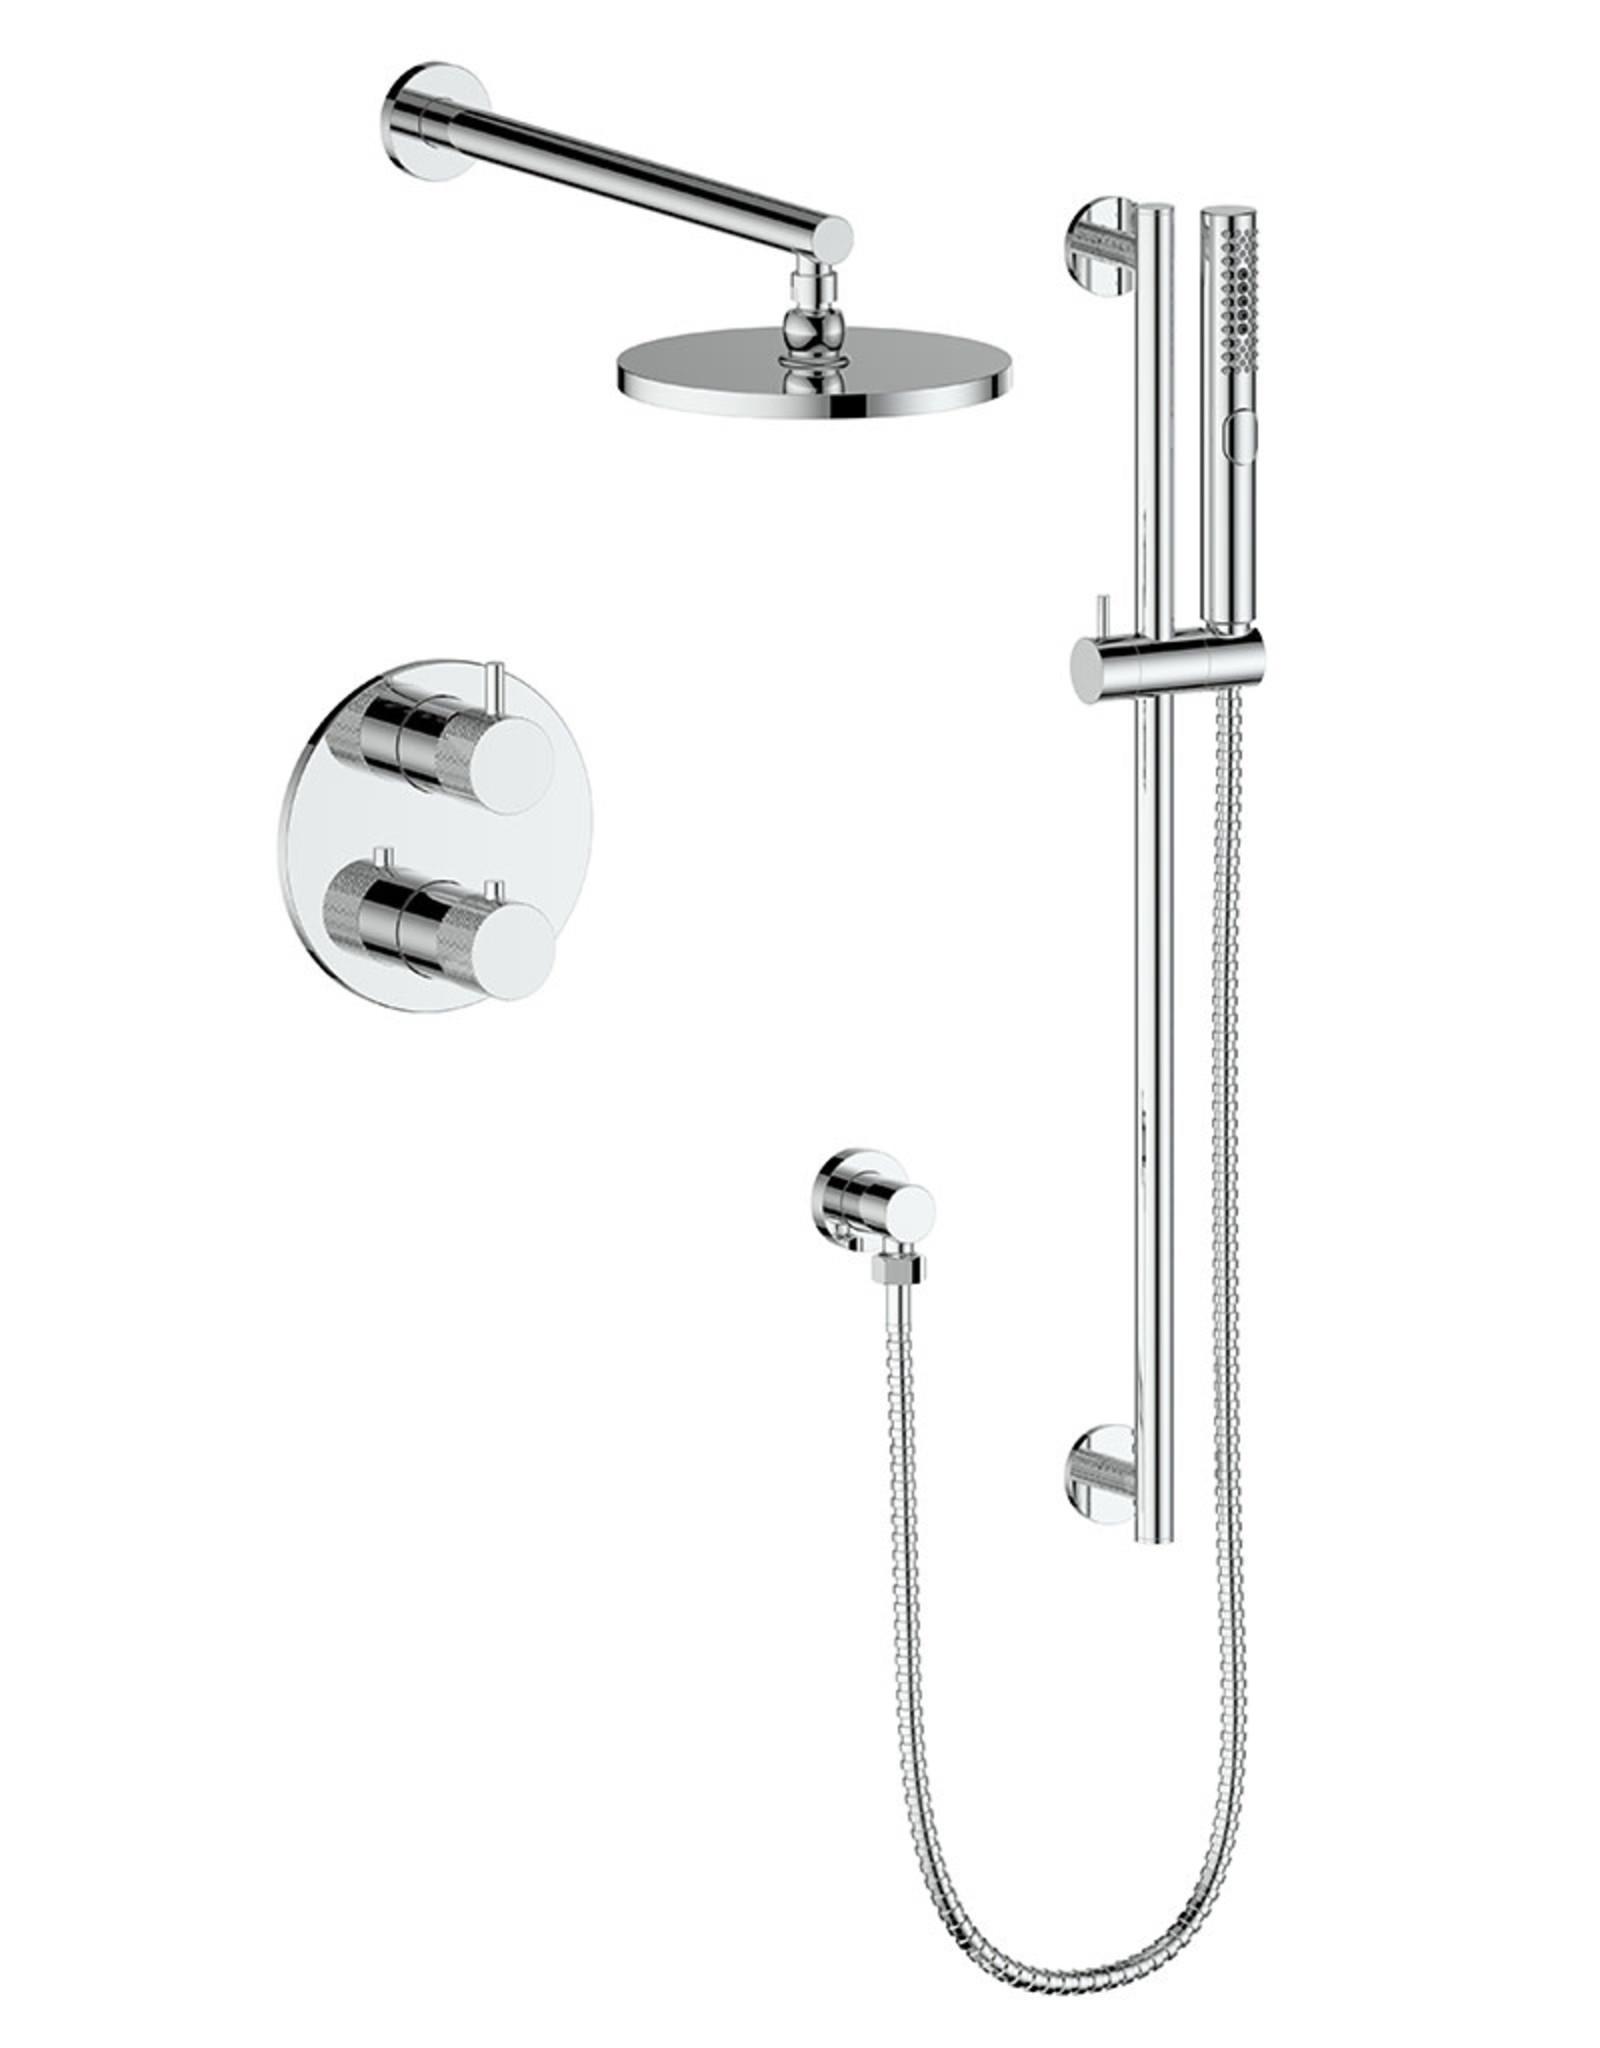 Vogt Drava 2-Way Thermostatic Shower System NO SPOUT- Chrome